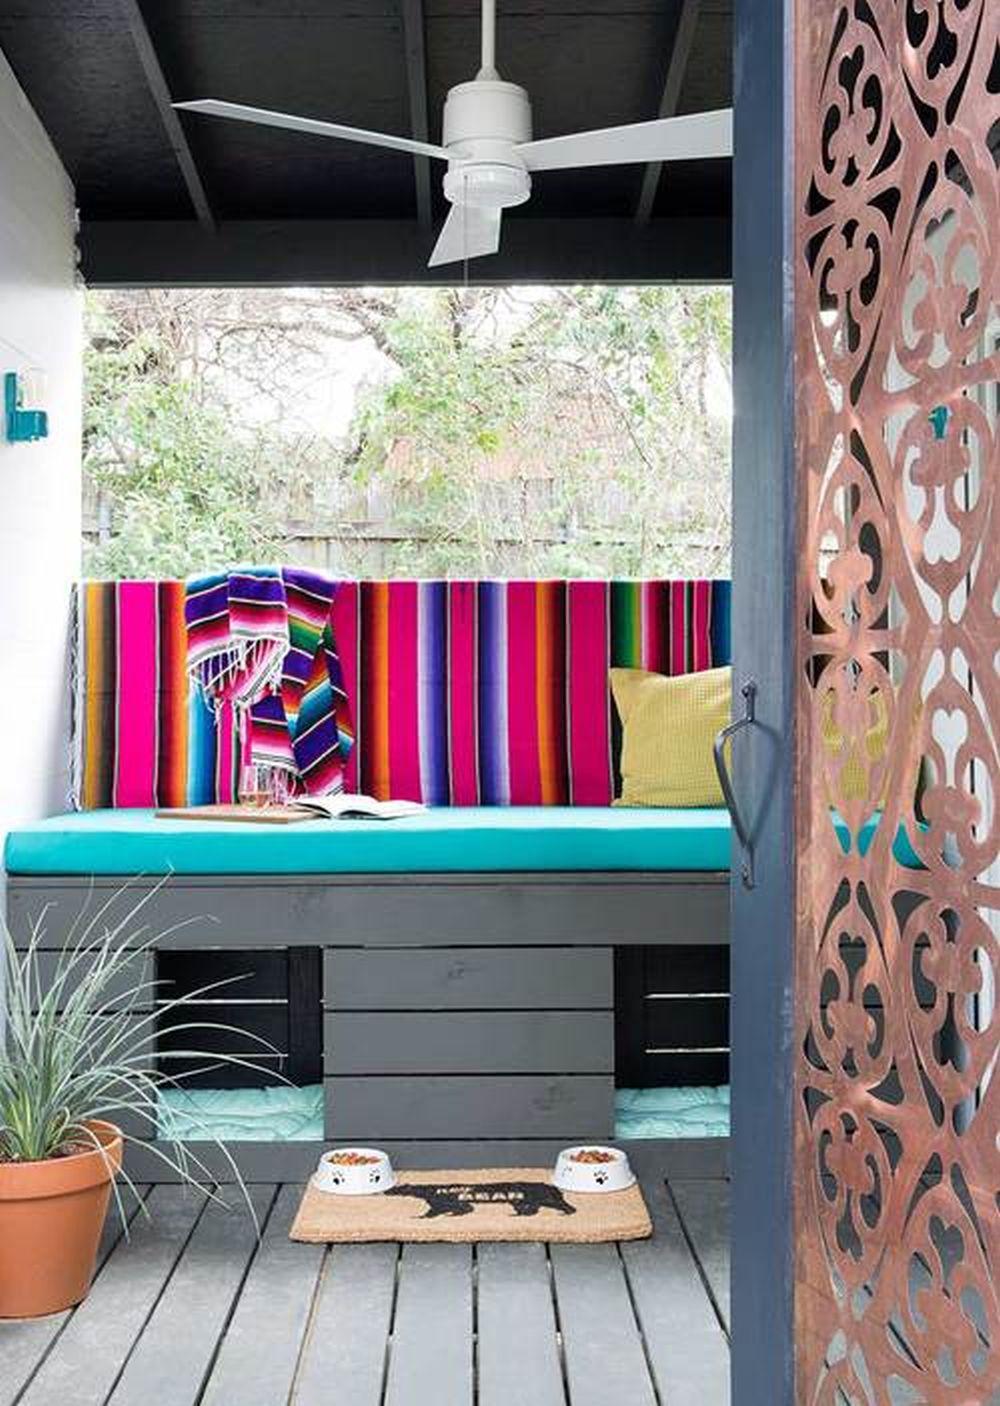 adelaparvu.com despre casa facuta din containere de camion, Designer Kim Lewis, Foto Molly Winters (16)